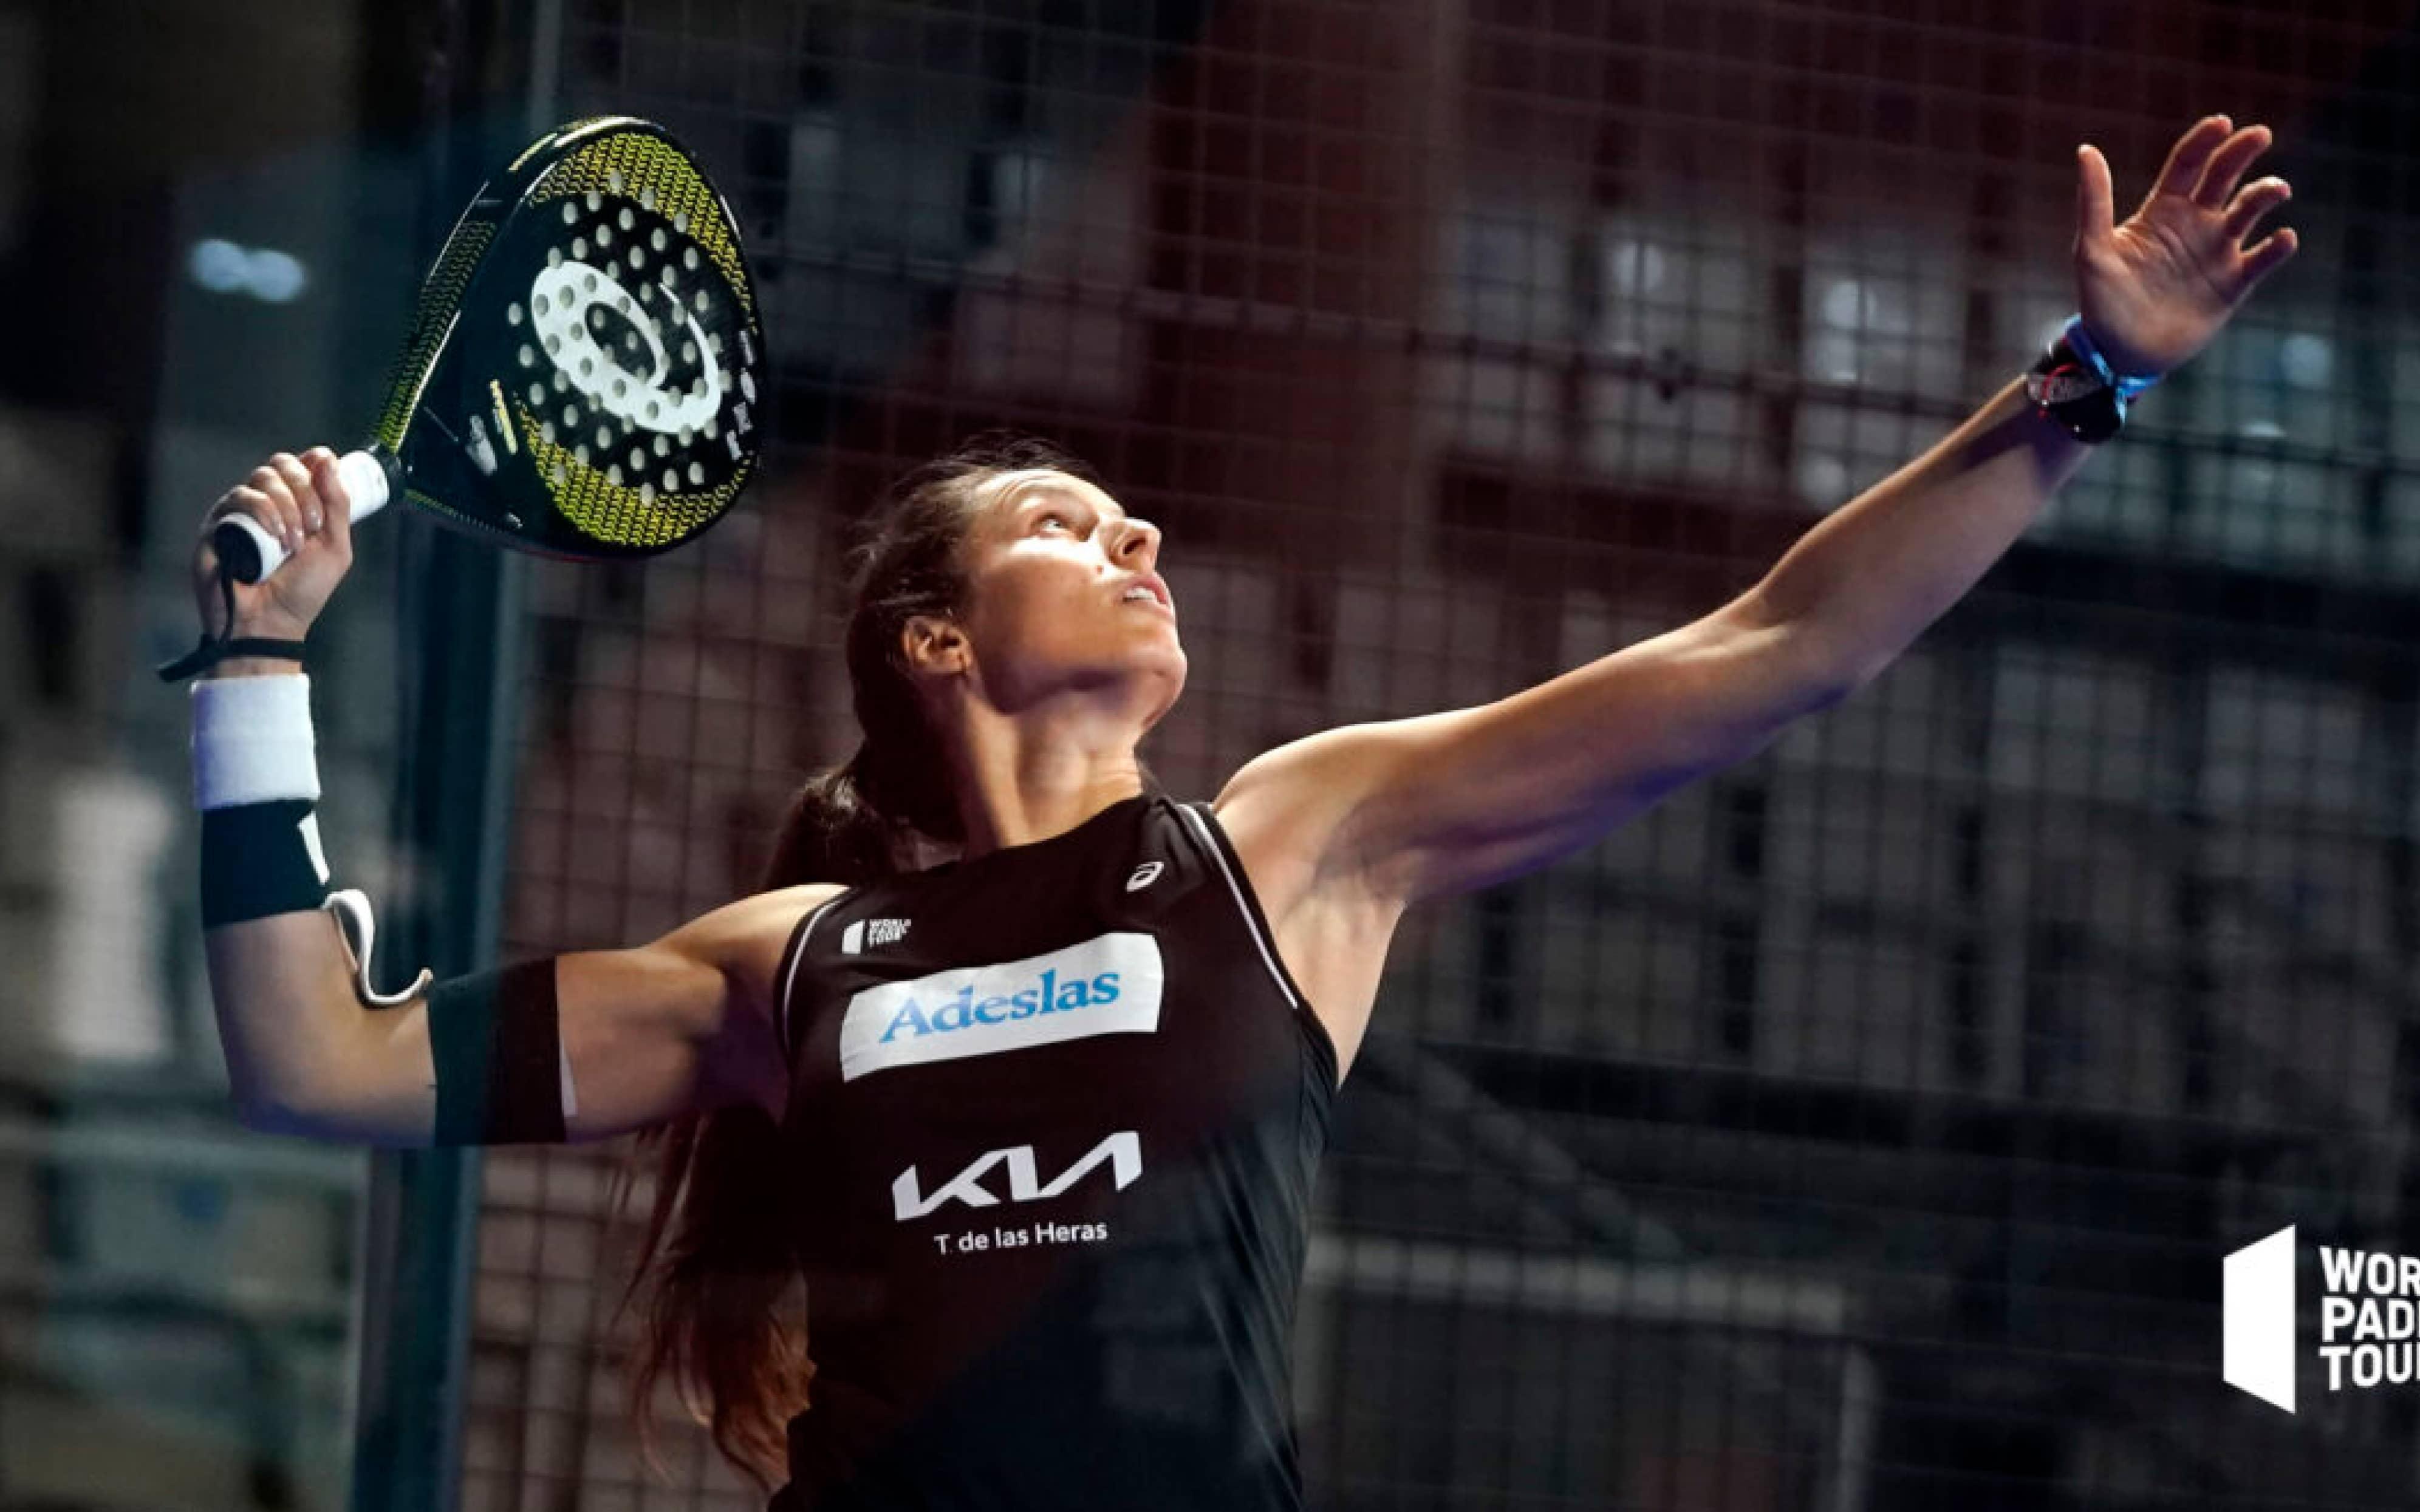 Top 5 powerful women dominating padel in 2021